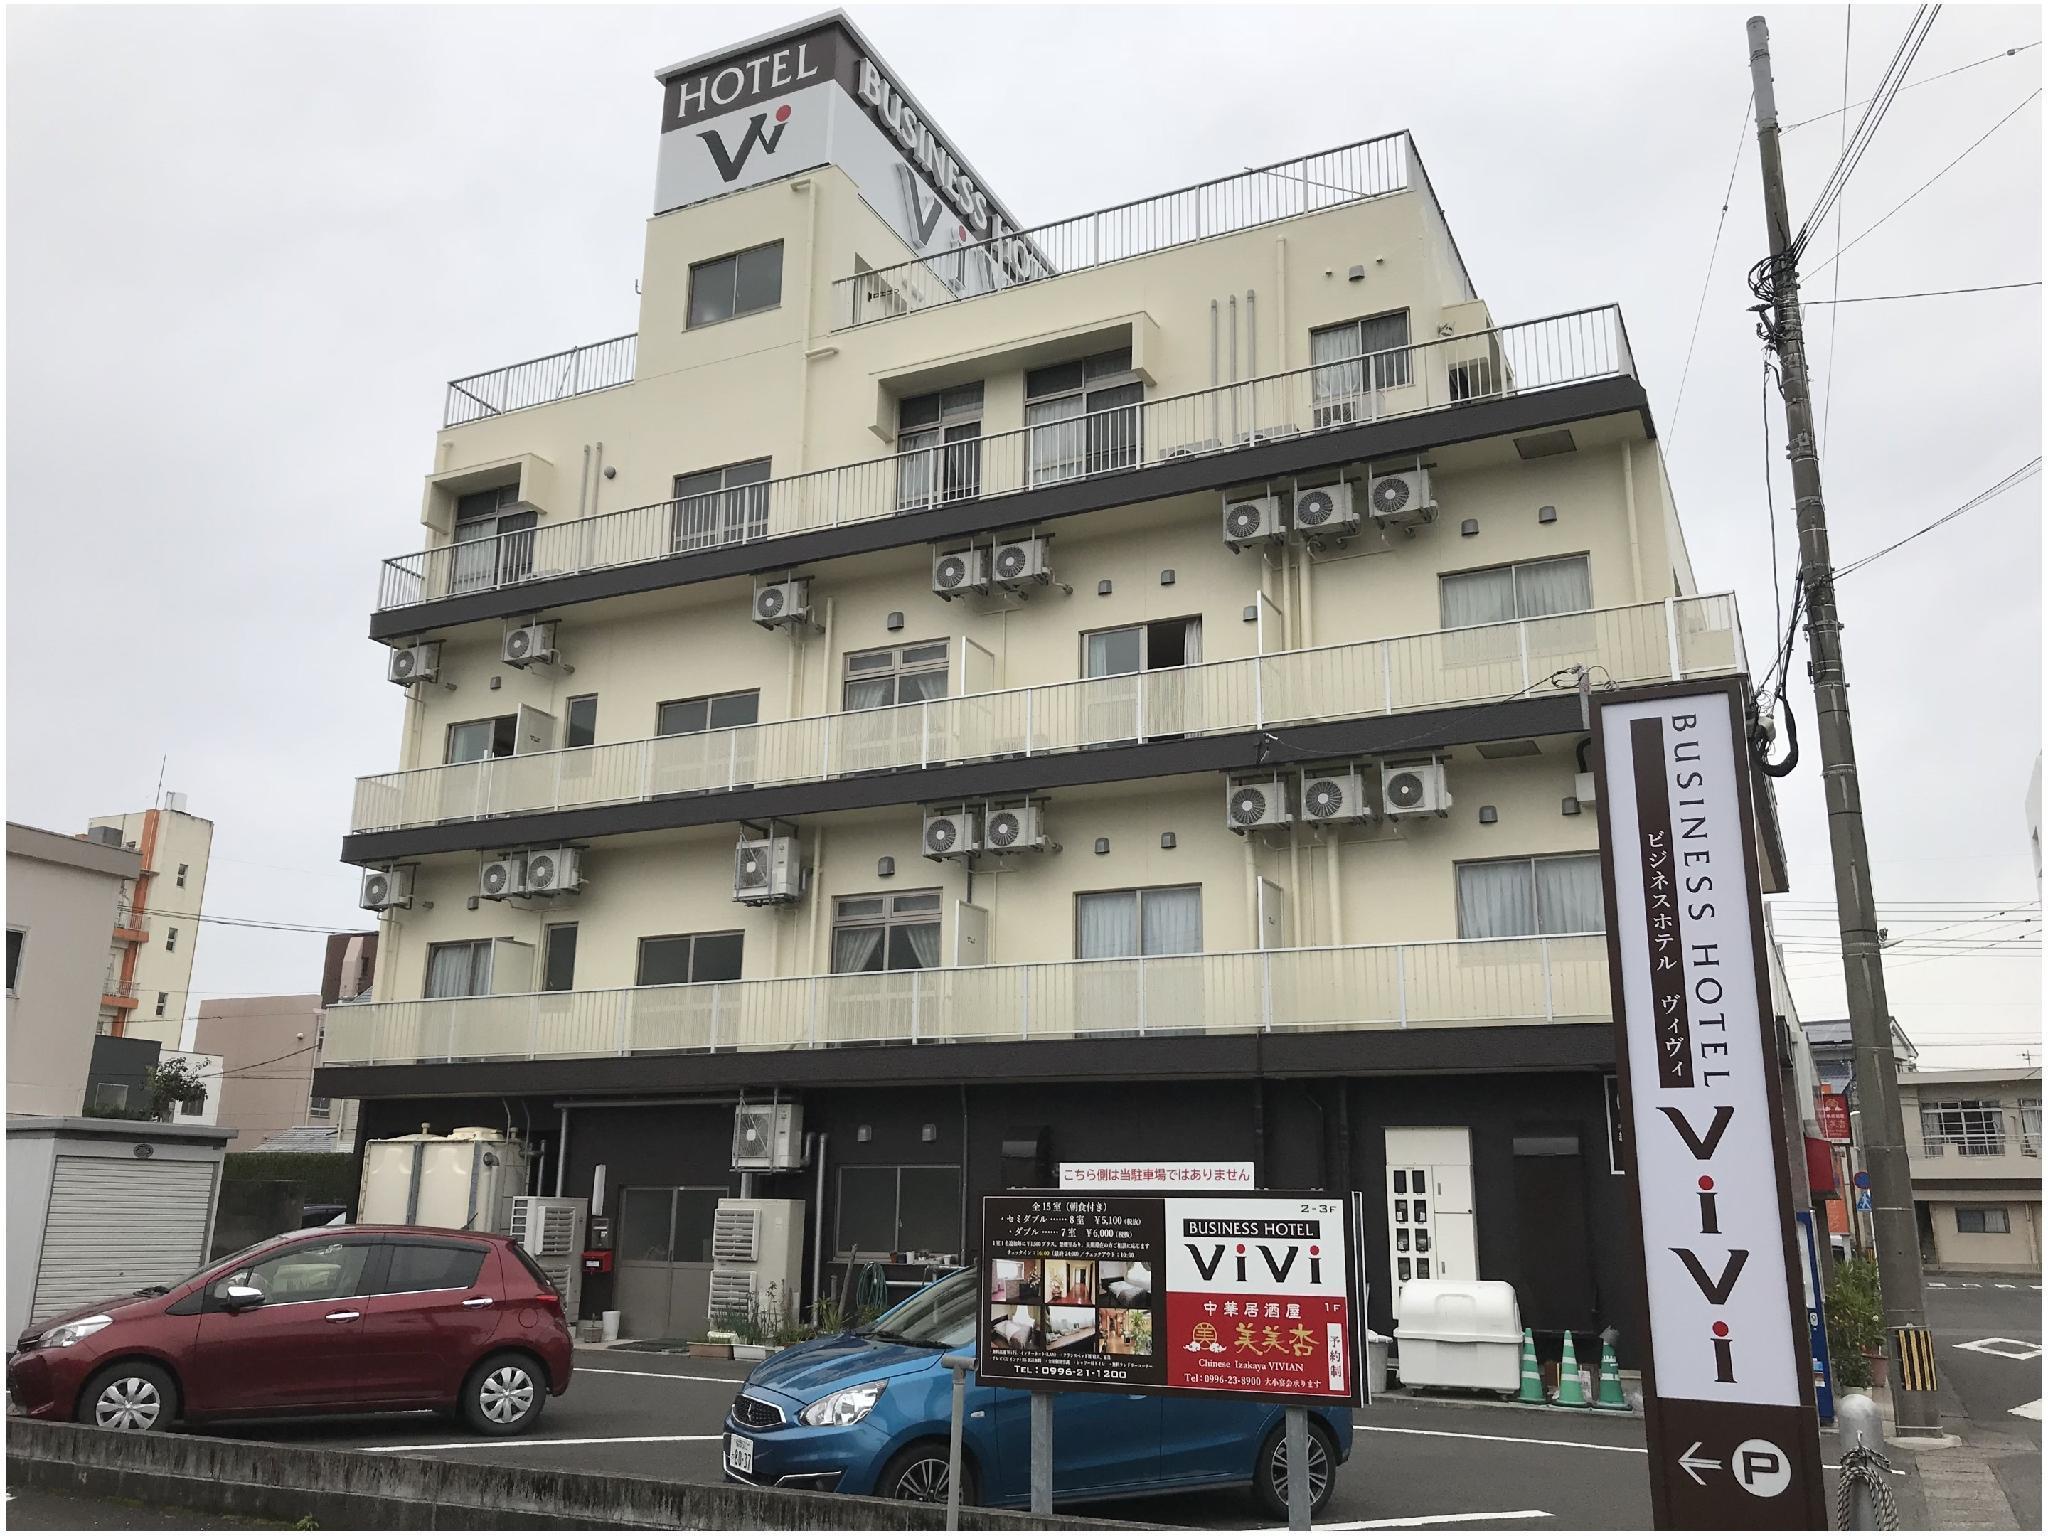 Business Hotel Vivi